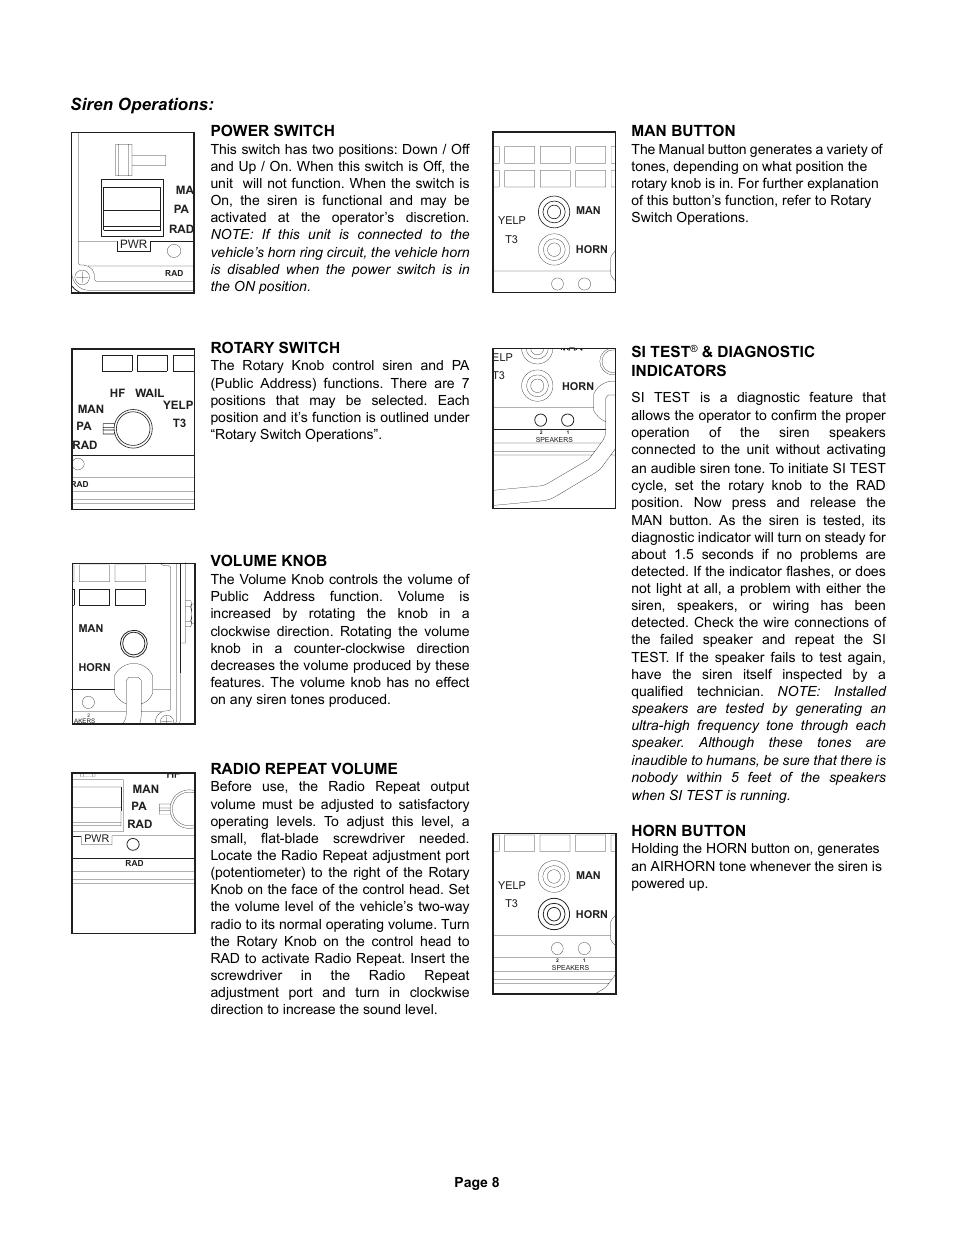 Whelen 295hfsa5 Installation Manual Data Wiring Diagrams How To Install Siren Operations Power Switch Rotary User Rh Manualsdir Com 295slsa6 295hfsa6